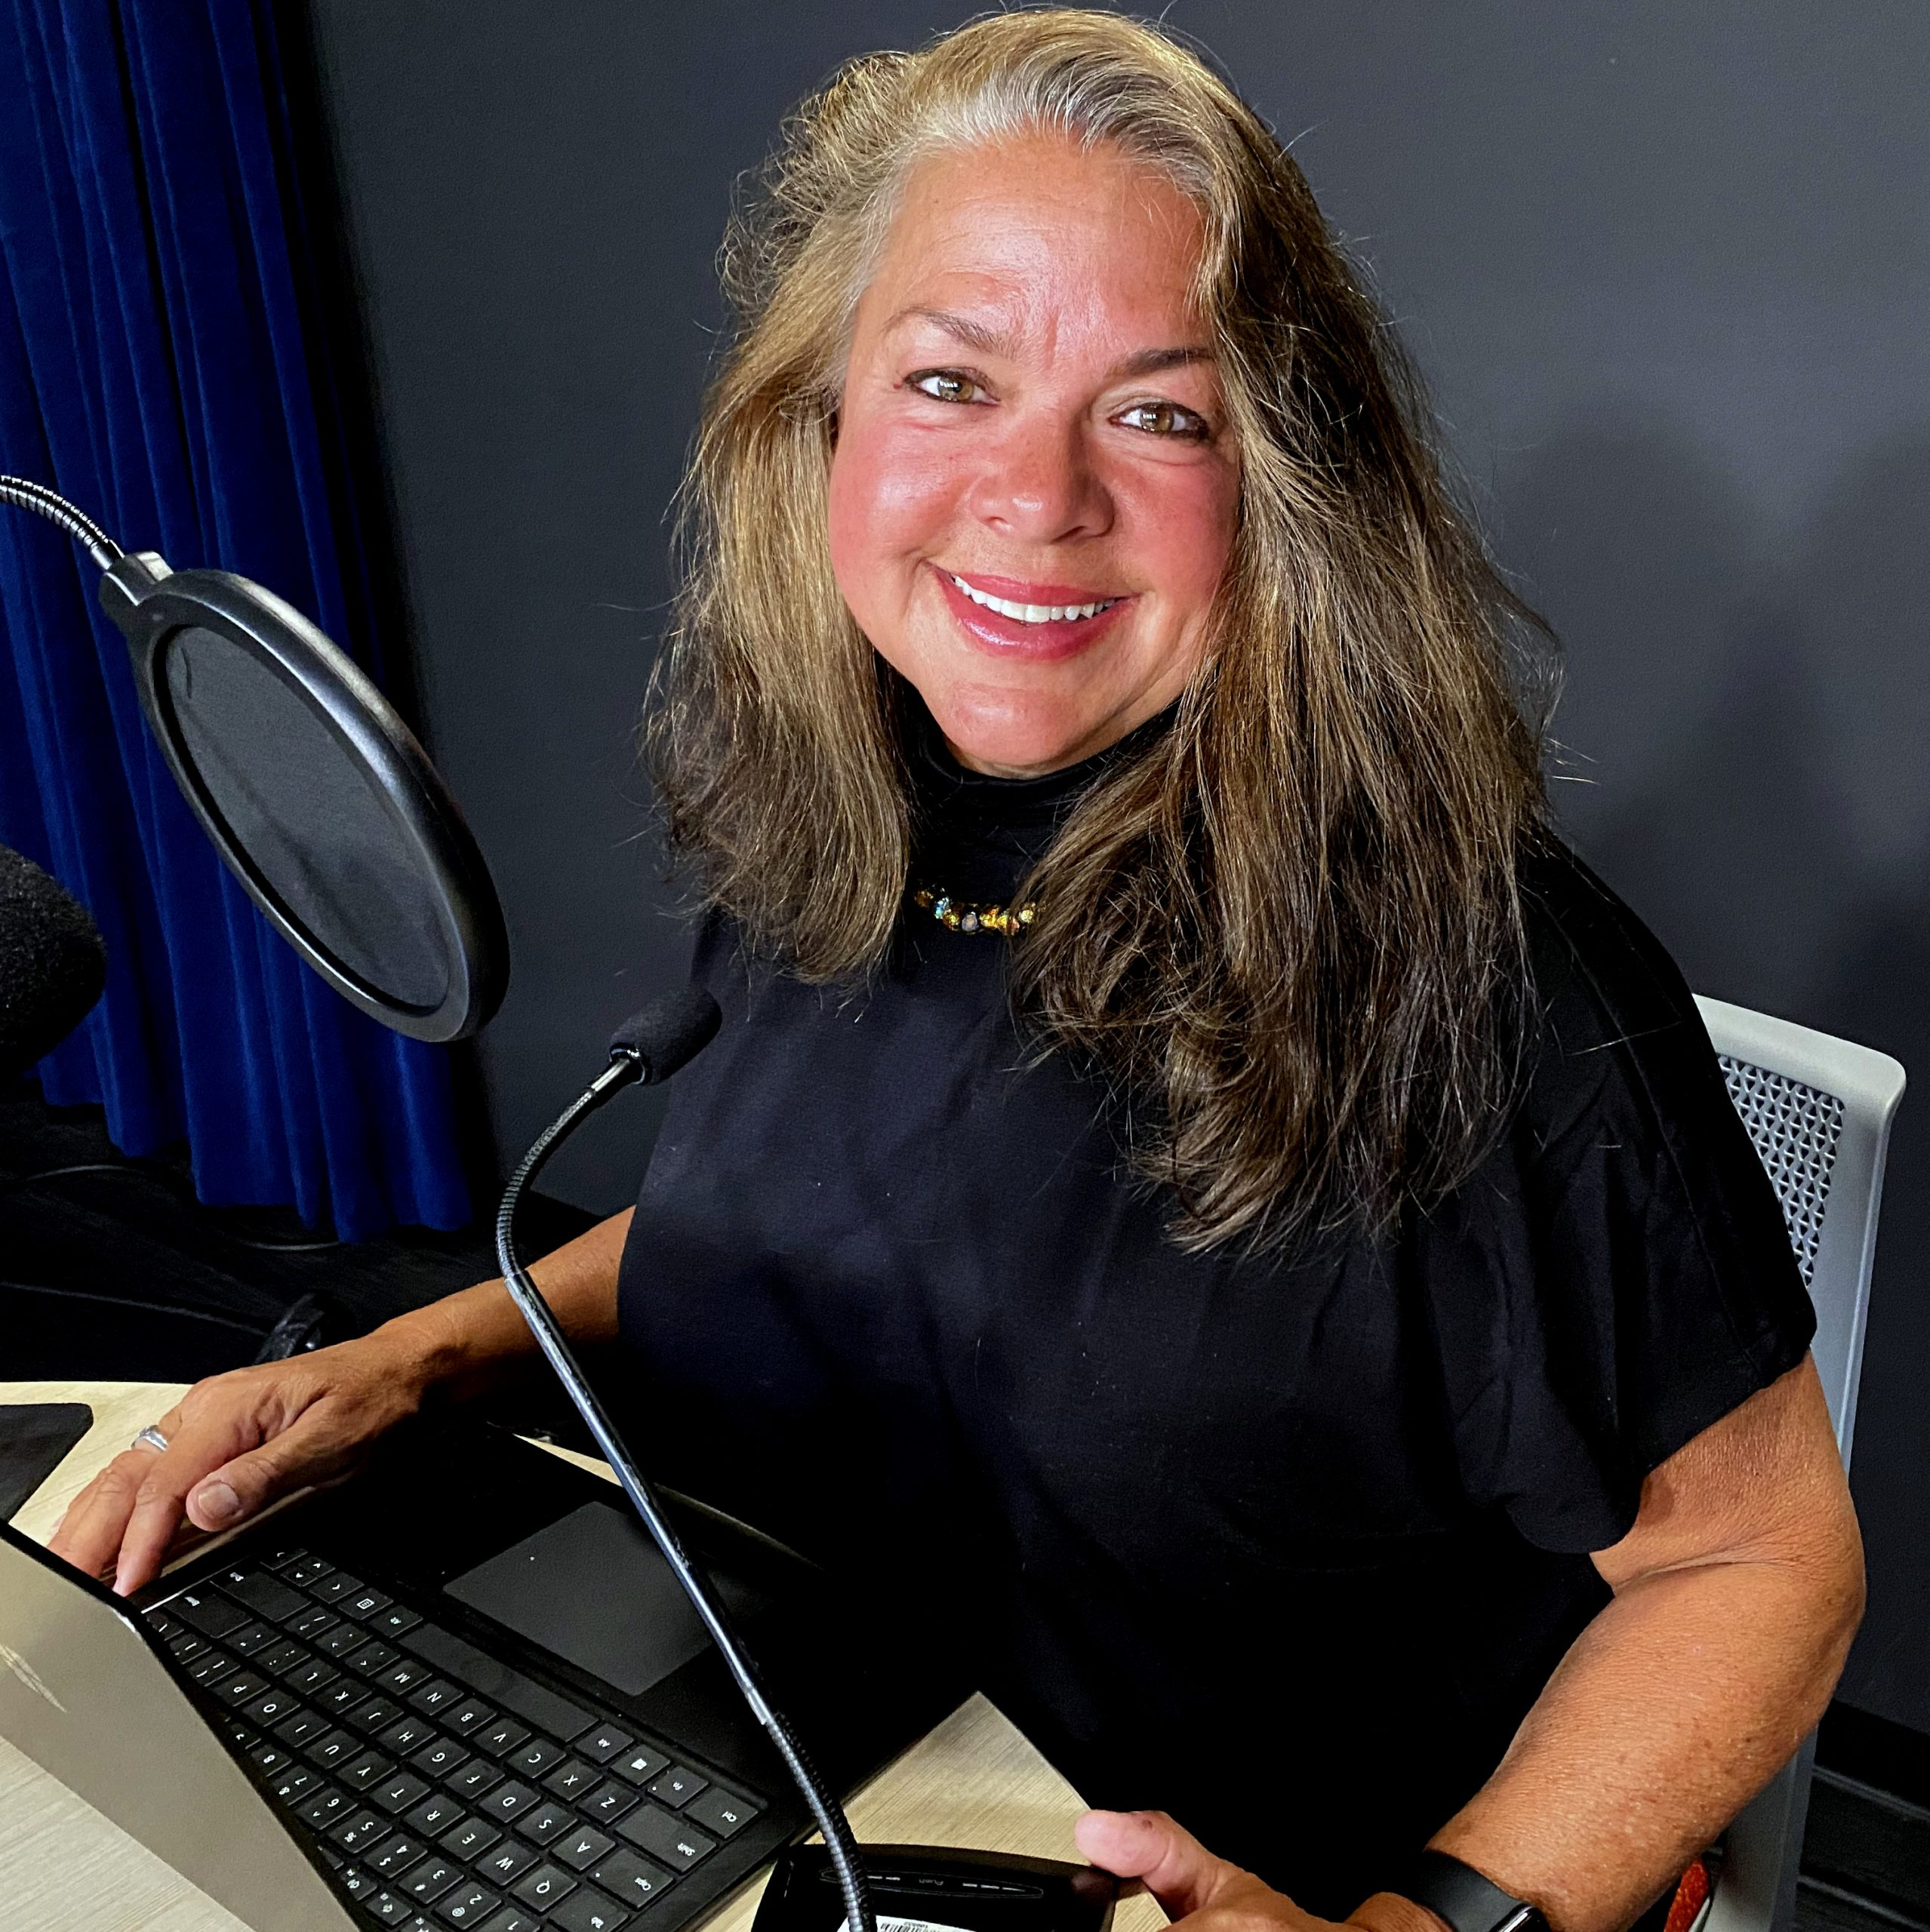 Image: Dr. Lynda Recording Her Audiobook